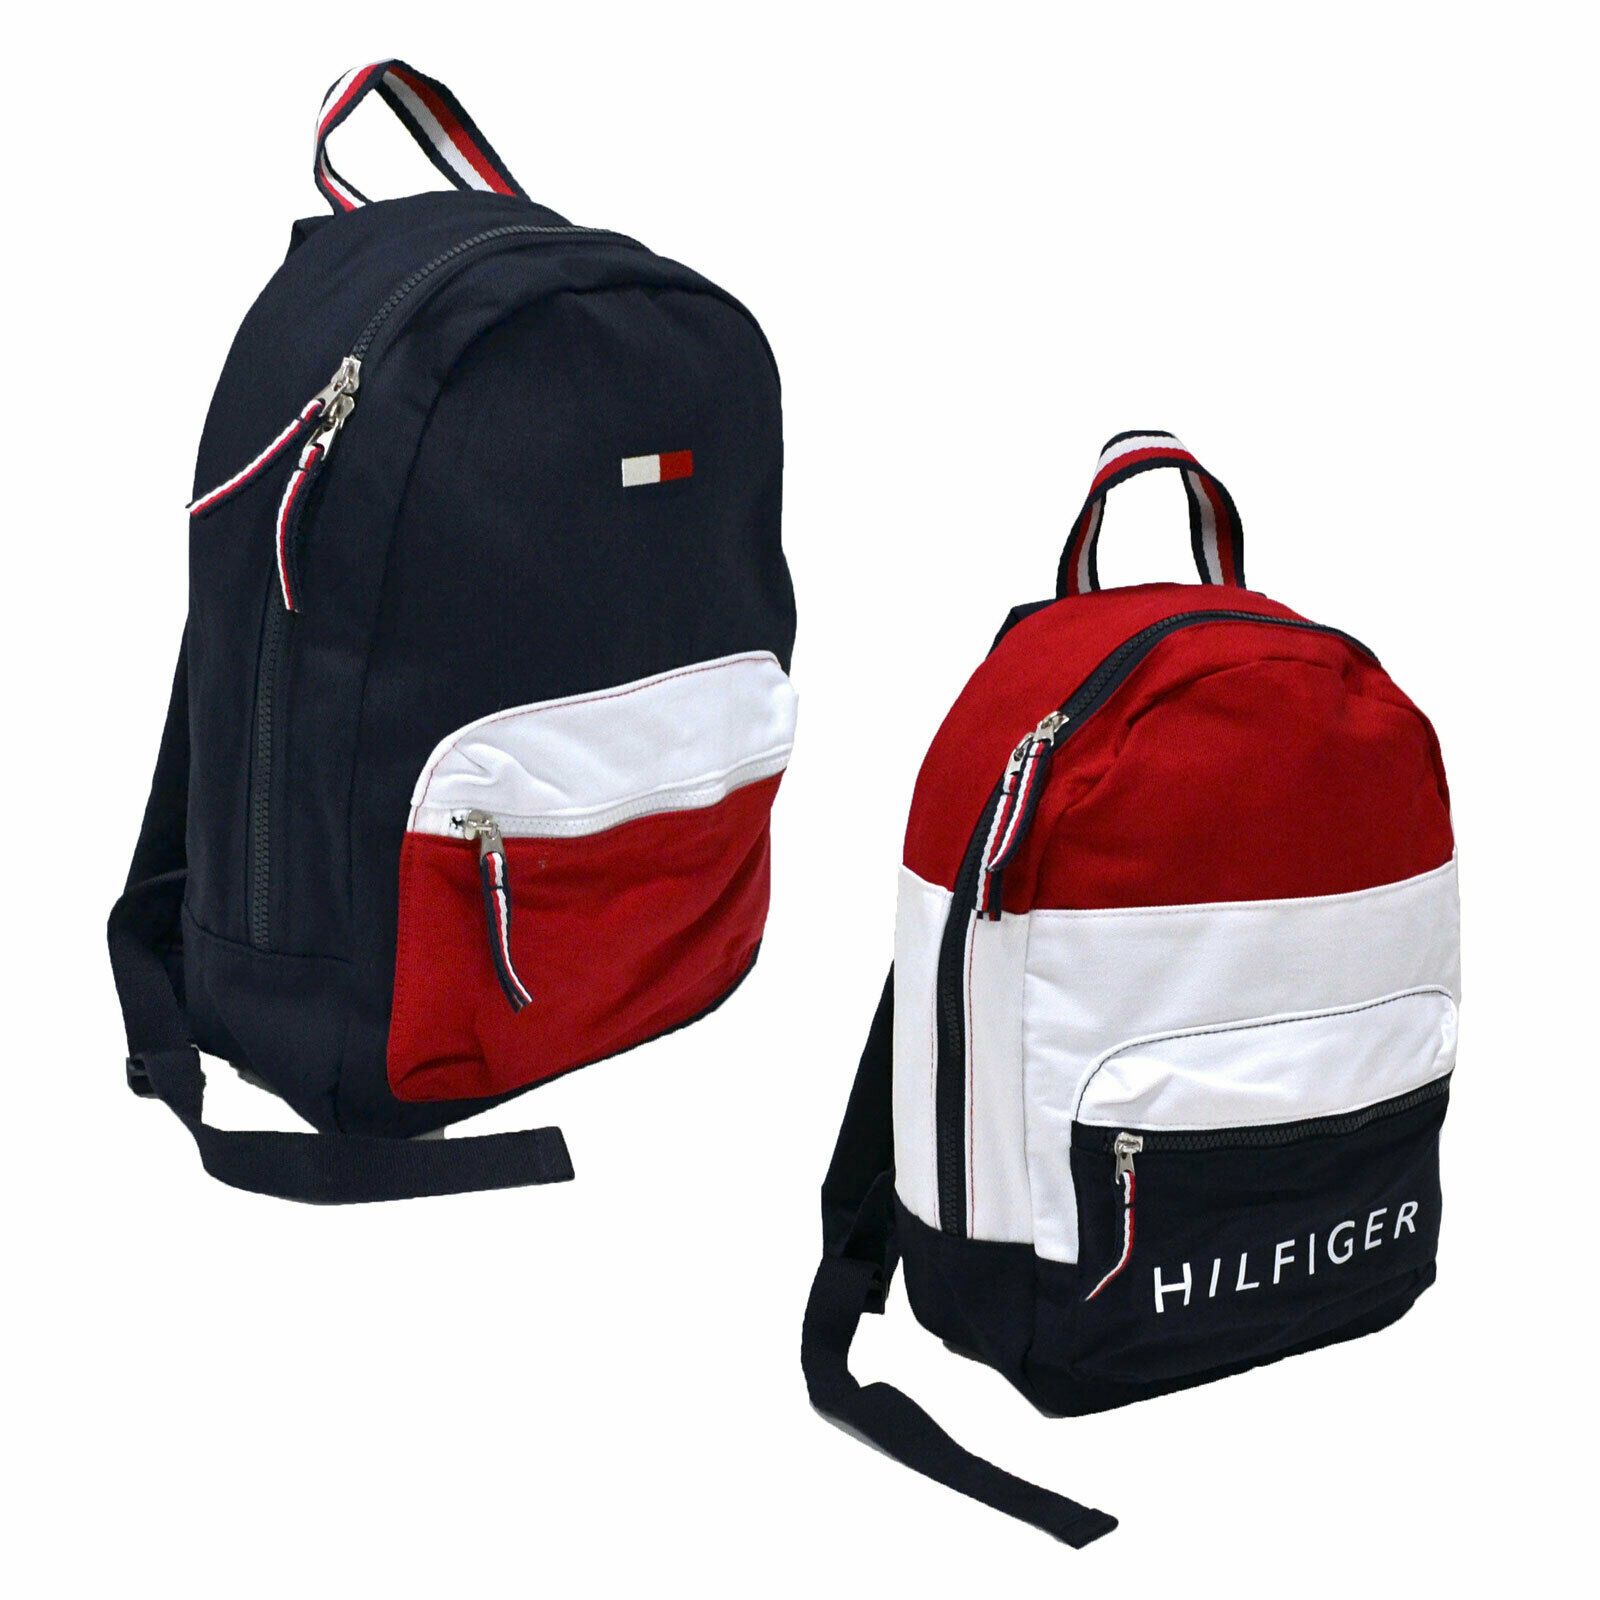 Tommy Hilfiger Backpack Canvas Small Book Bag 2 Pocket Schoo